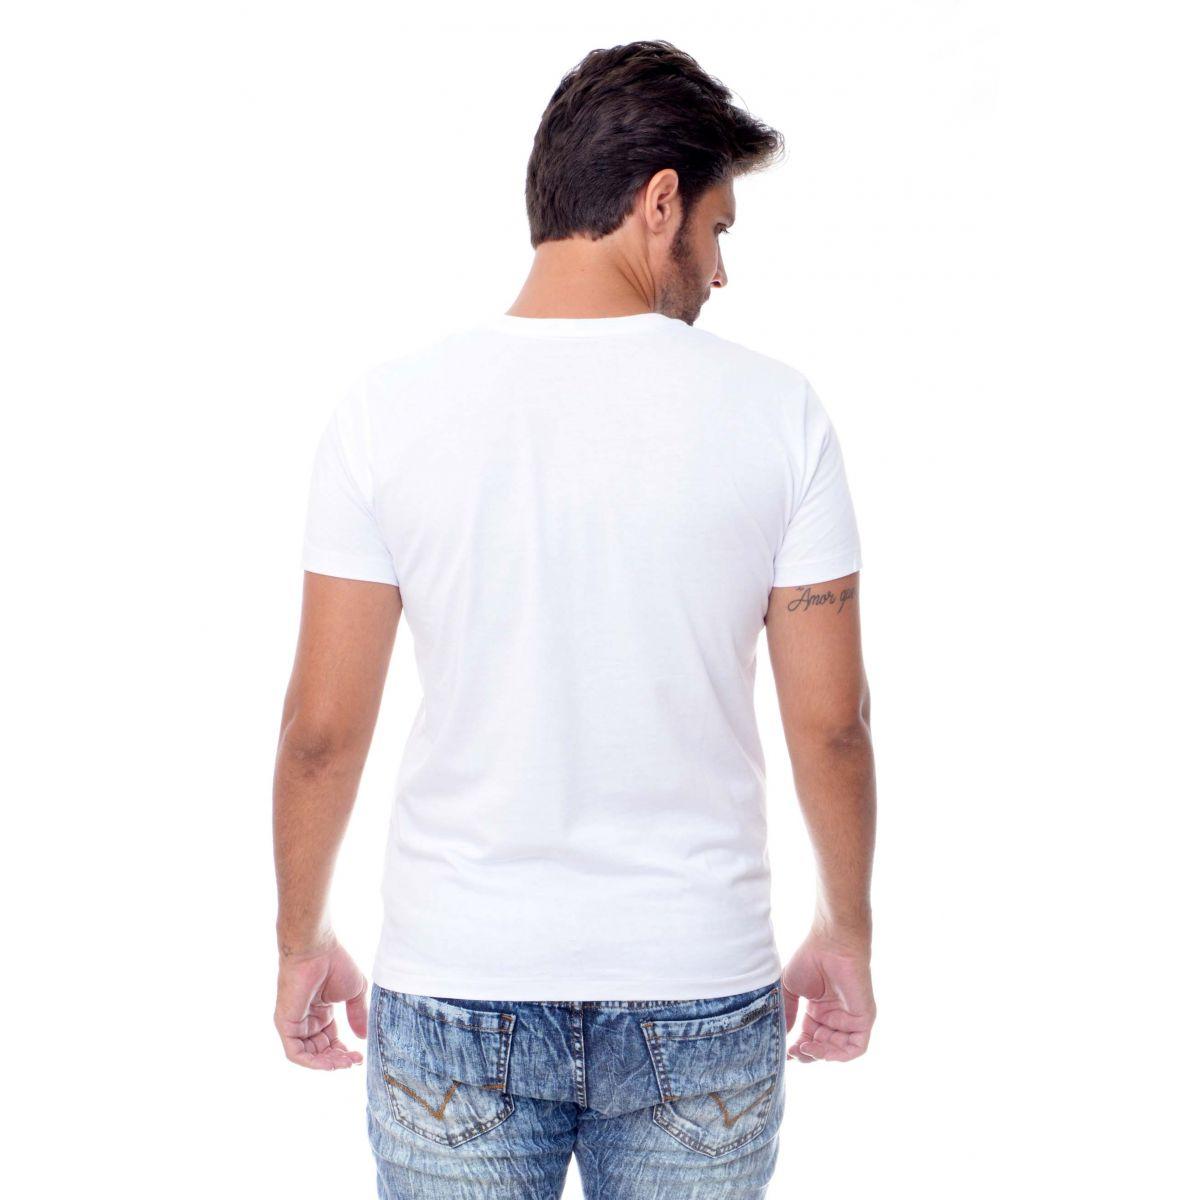 Camiseta Armani Exchange Letters Branca  - Ca Brasileira